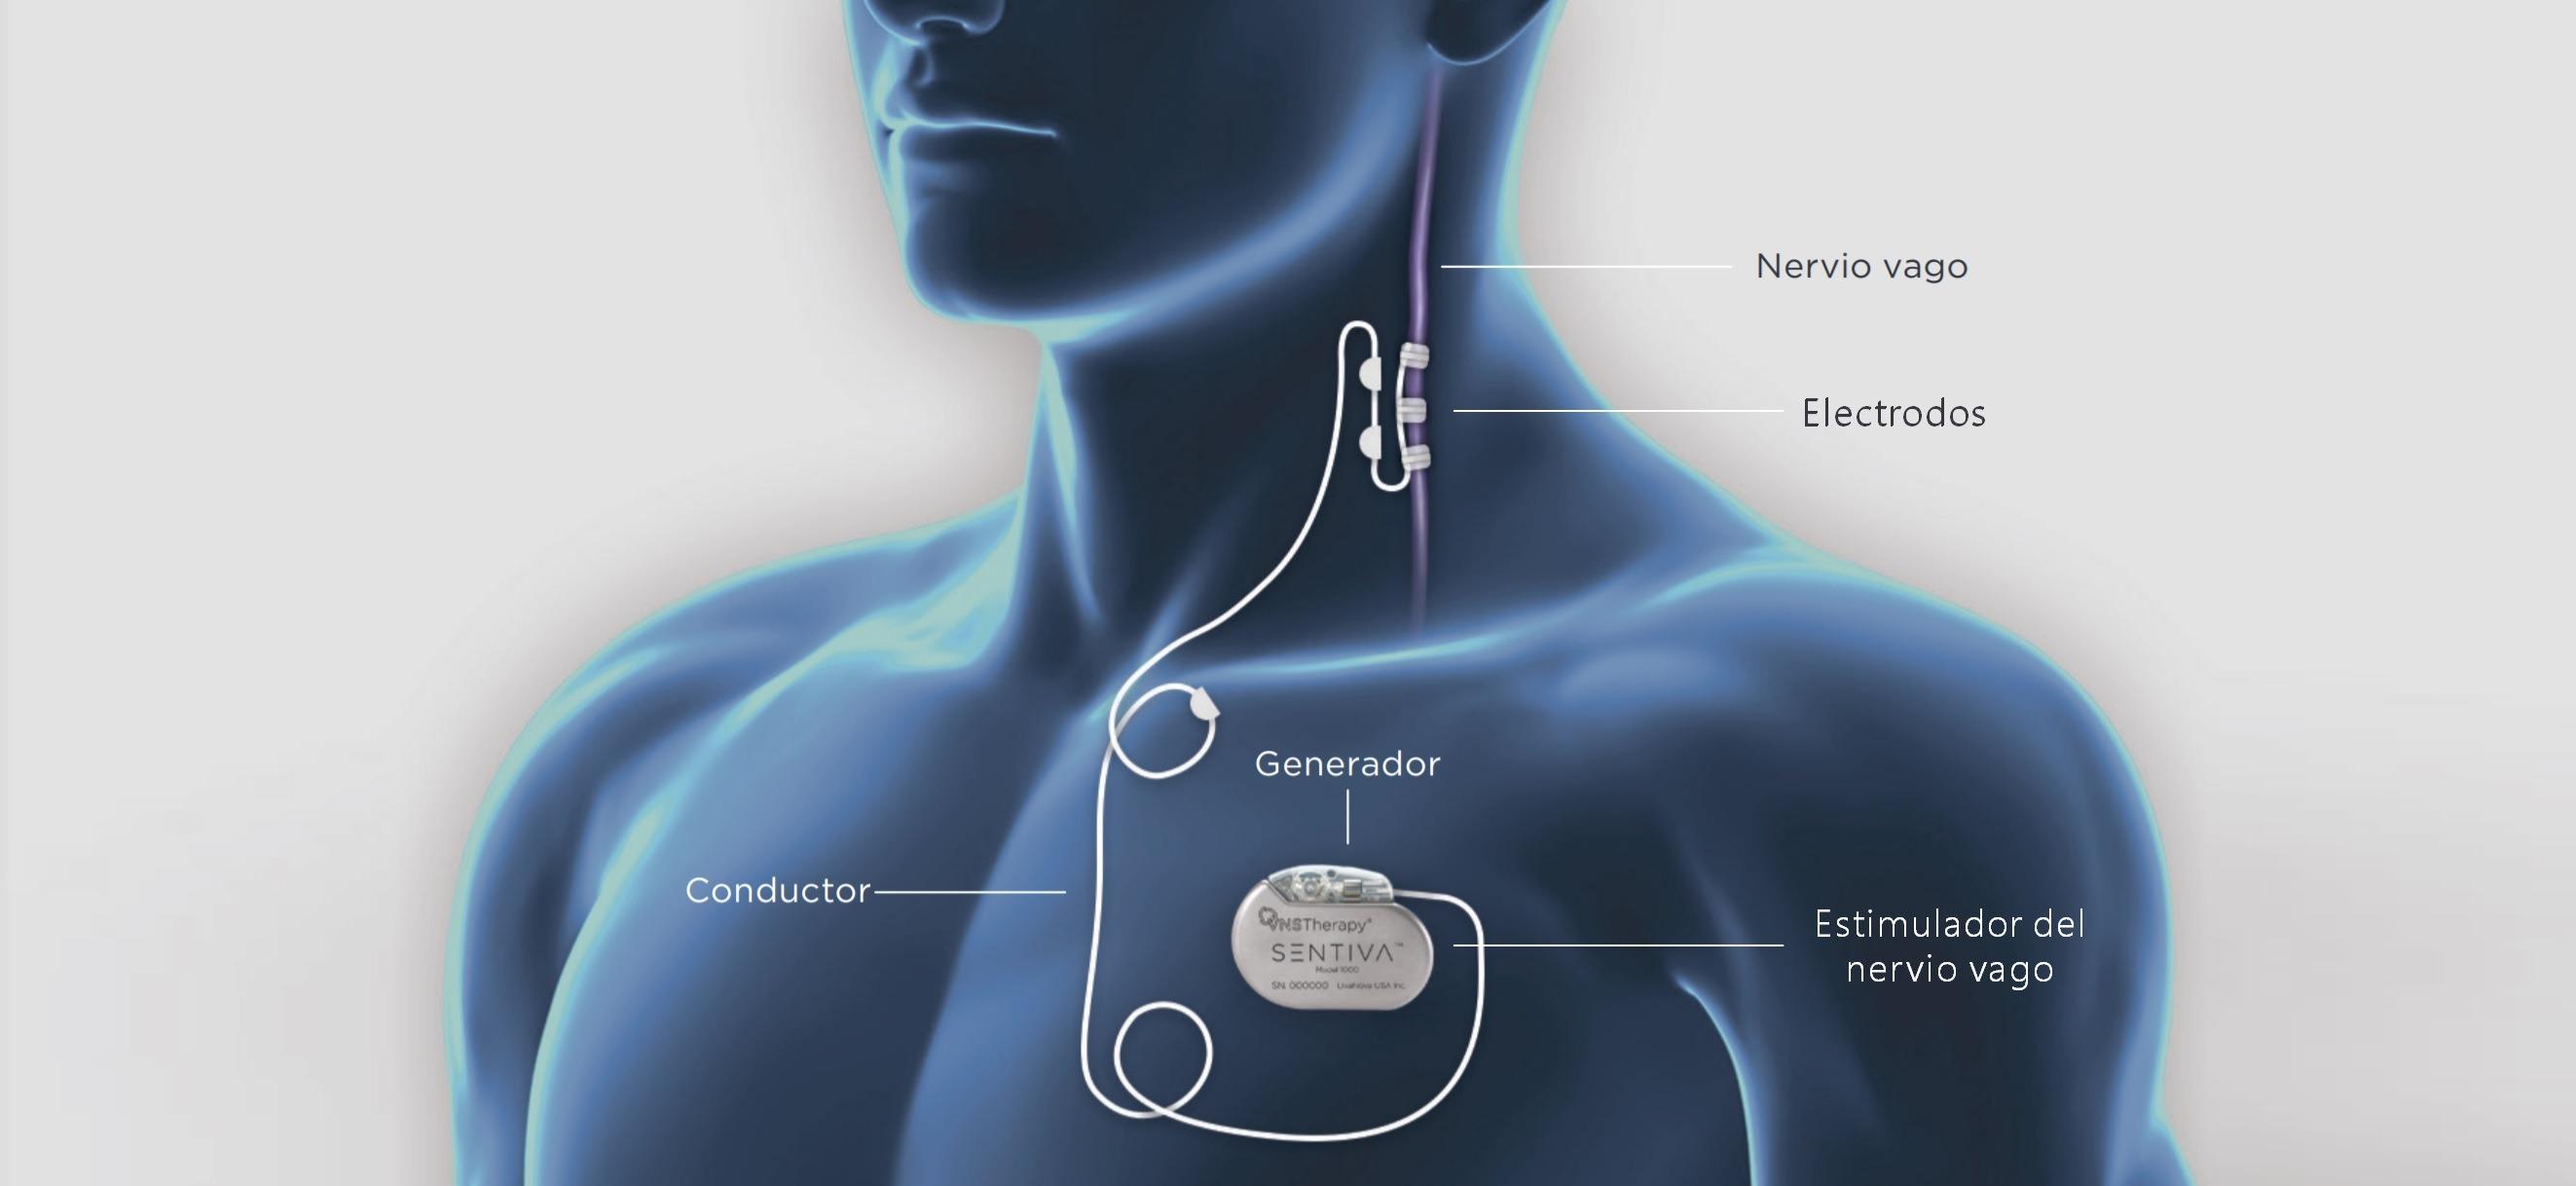 Estimulador del nervio vago